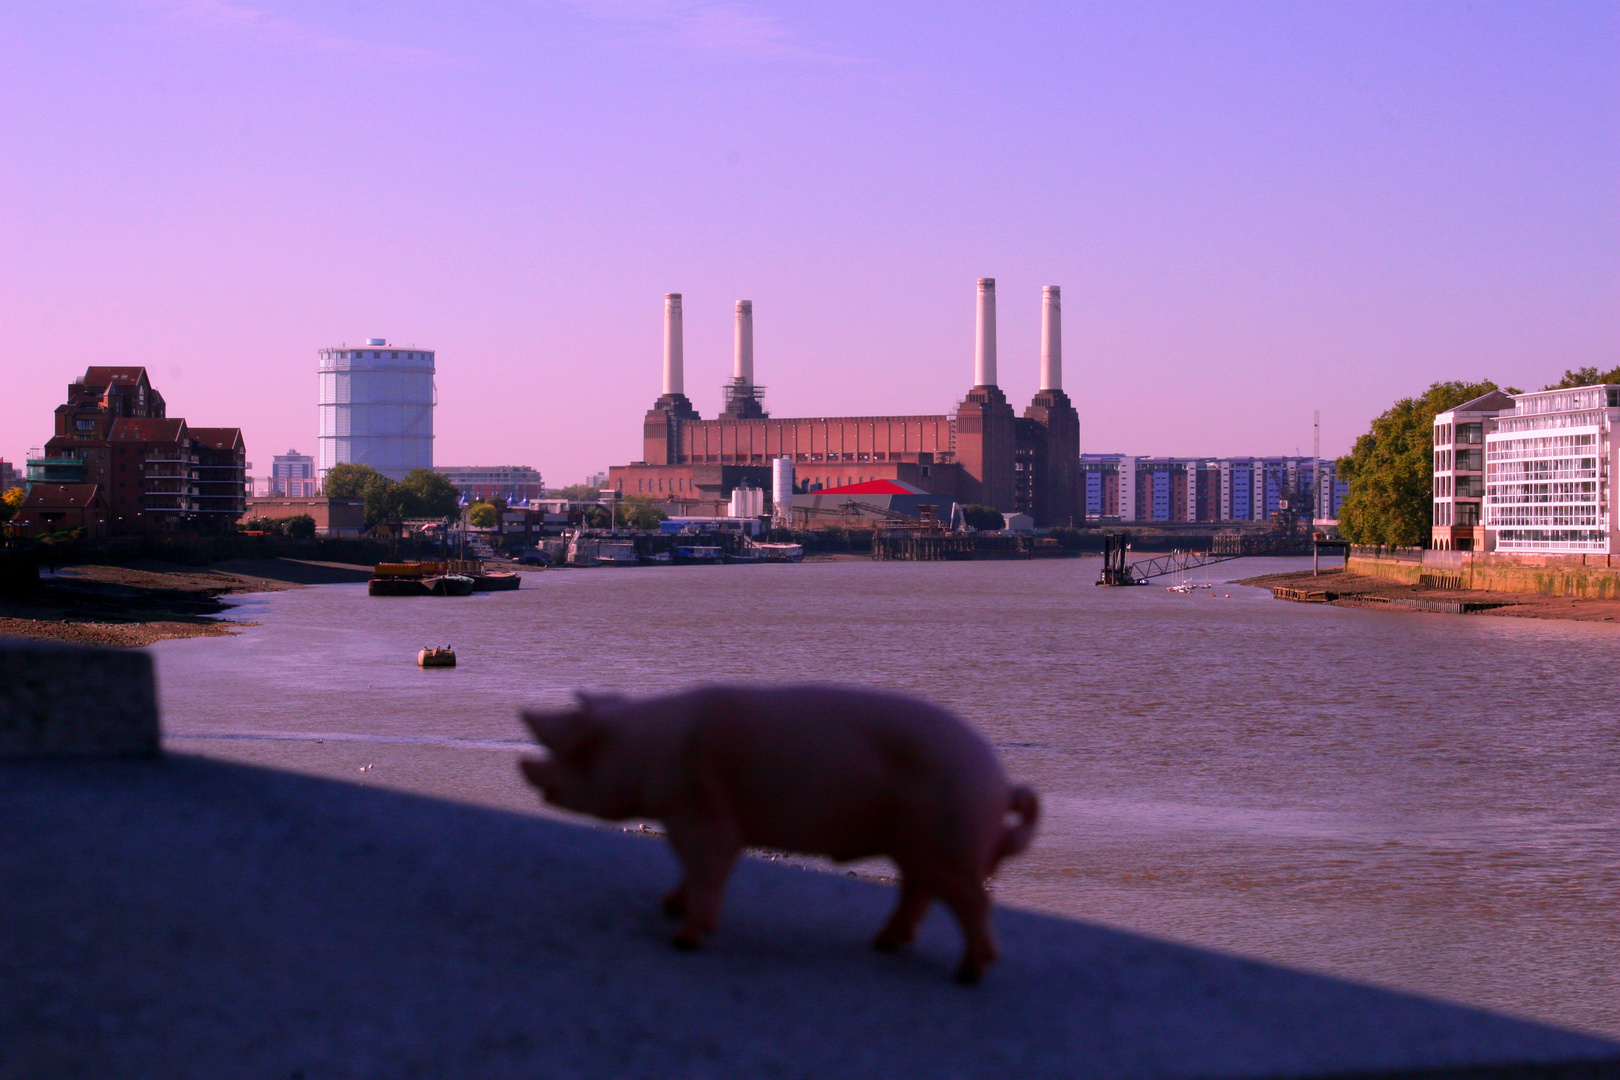 Pink Floyd -Animals- in London